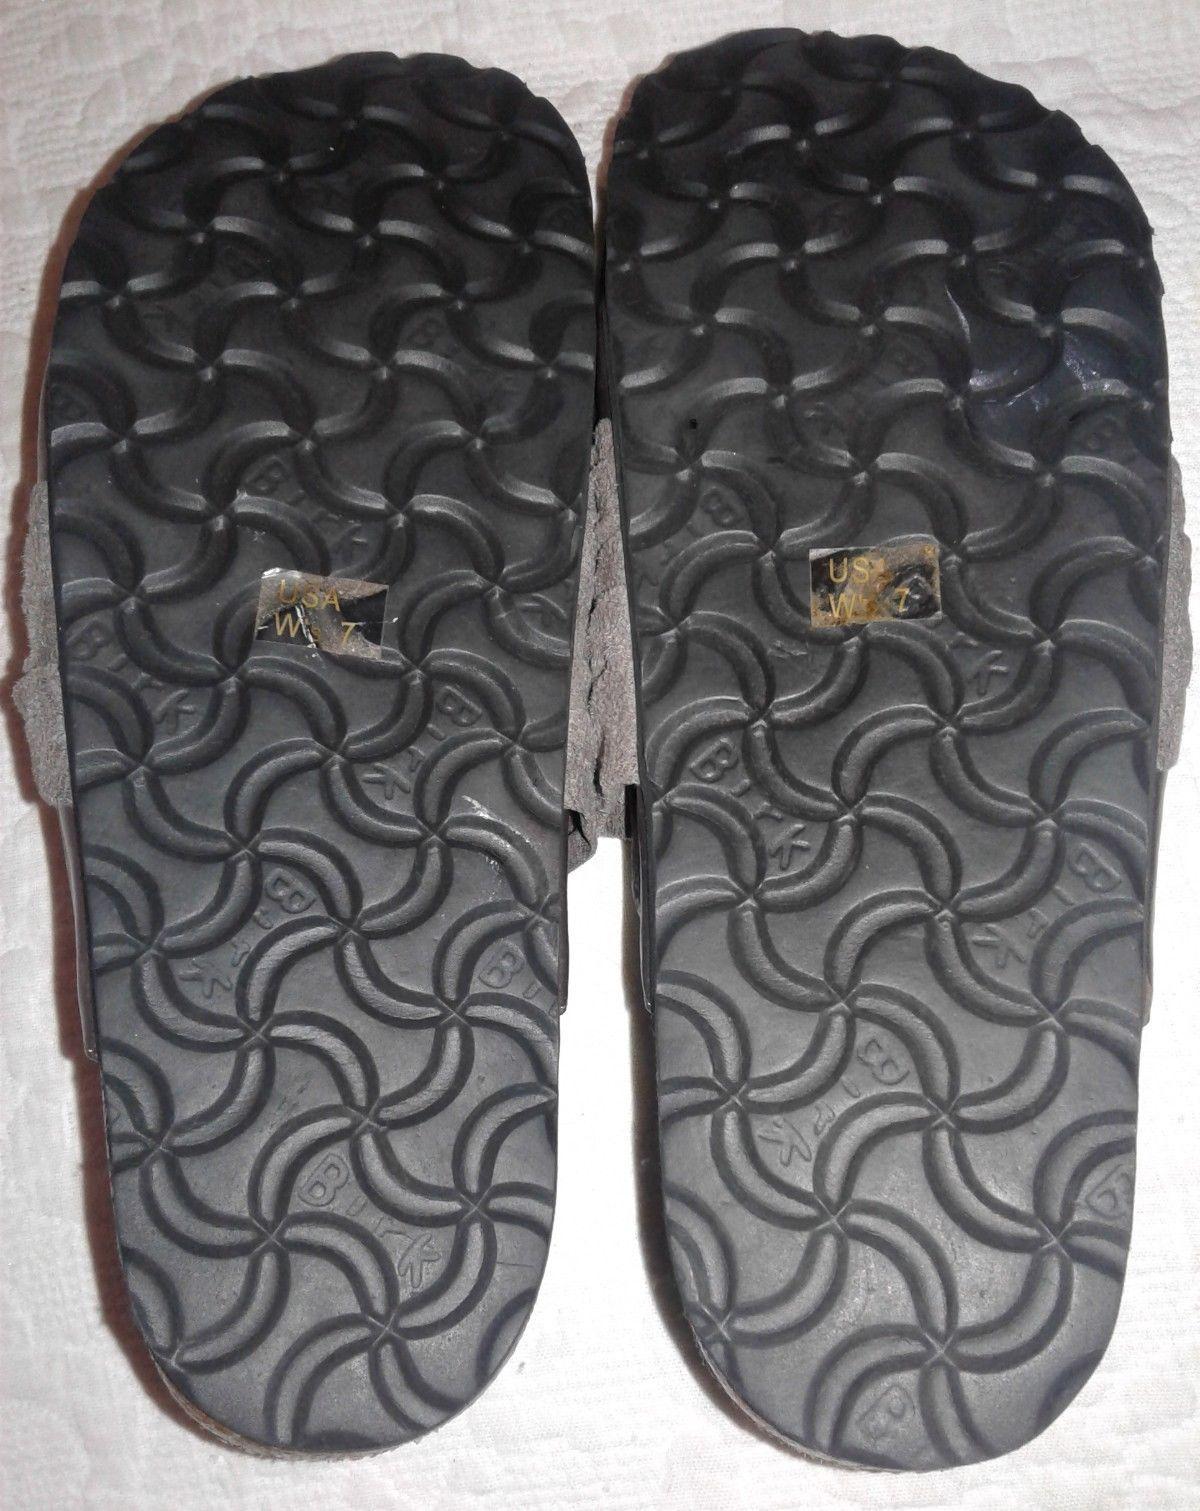 4e162020fda Birkenstock Tatami Slides Mules Womens Size and 50 similar items